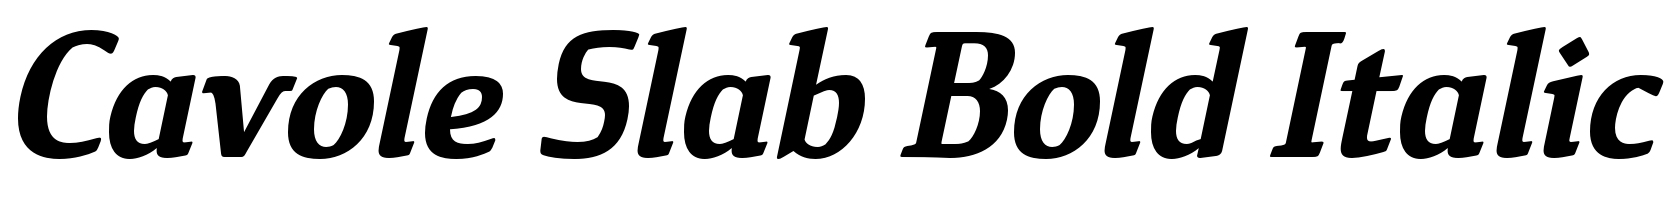 Cavole Slab Bold Italic